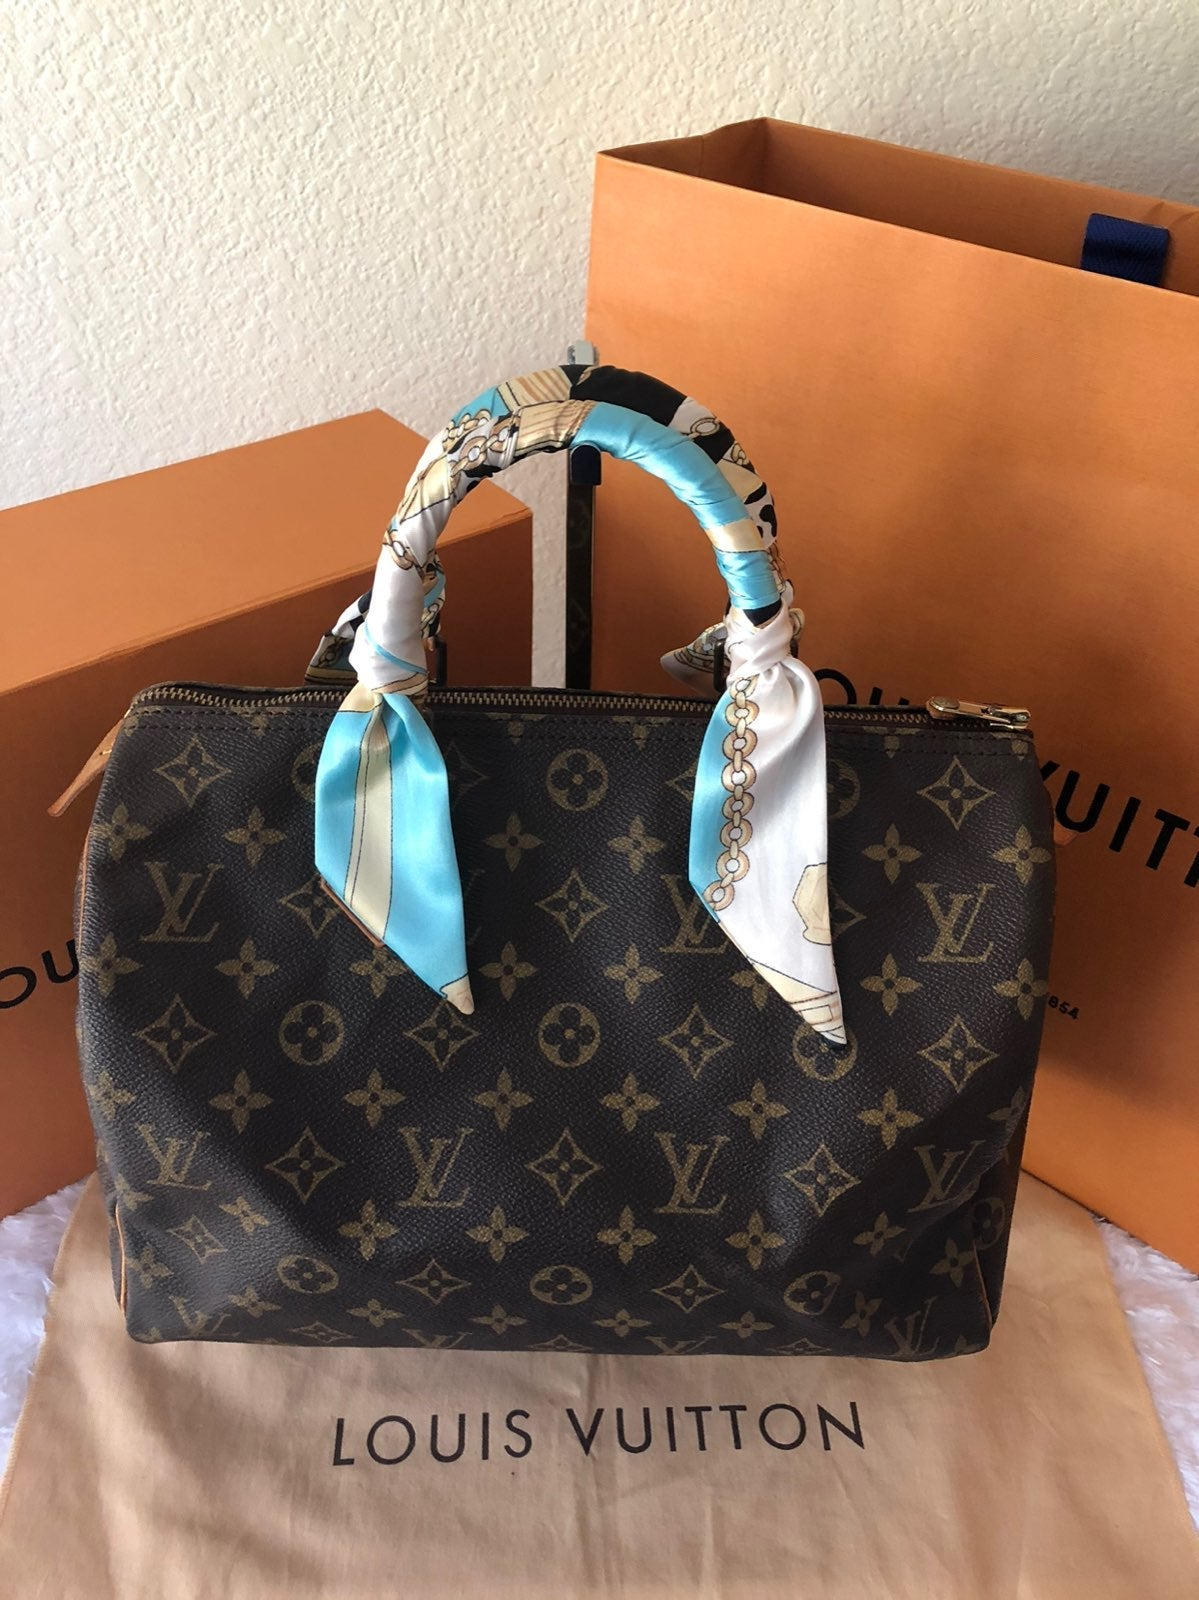 Louis Vuitton Speedy 30 Mono Satchel Bag